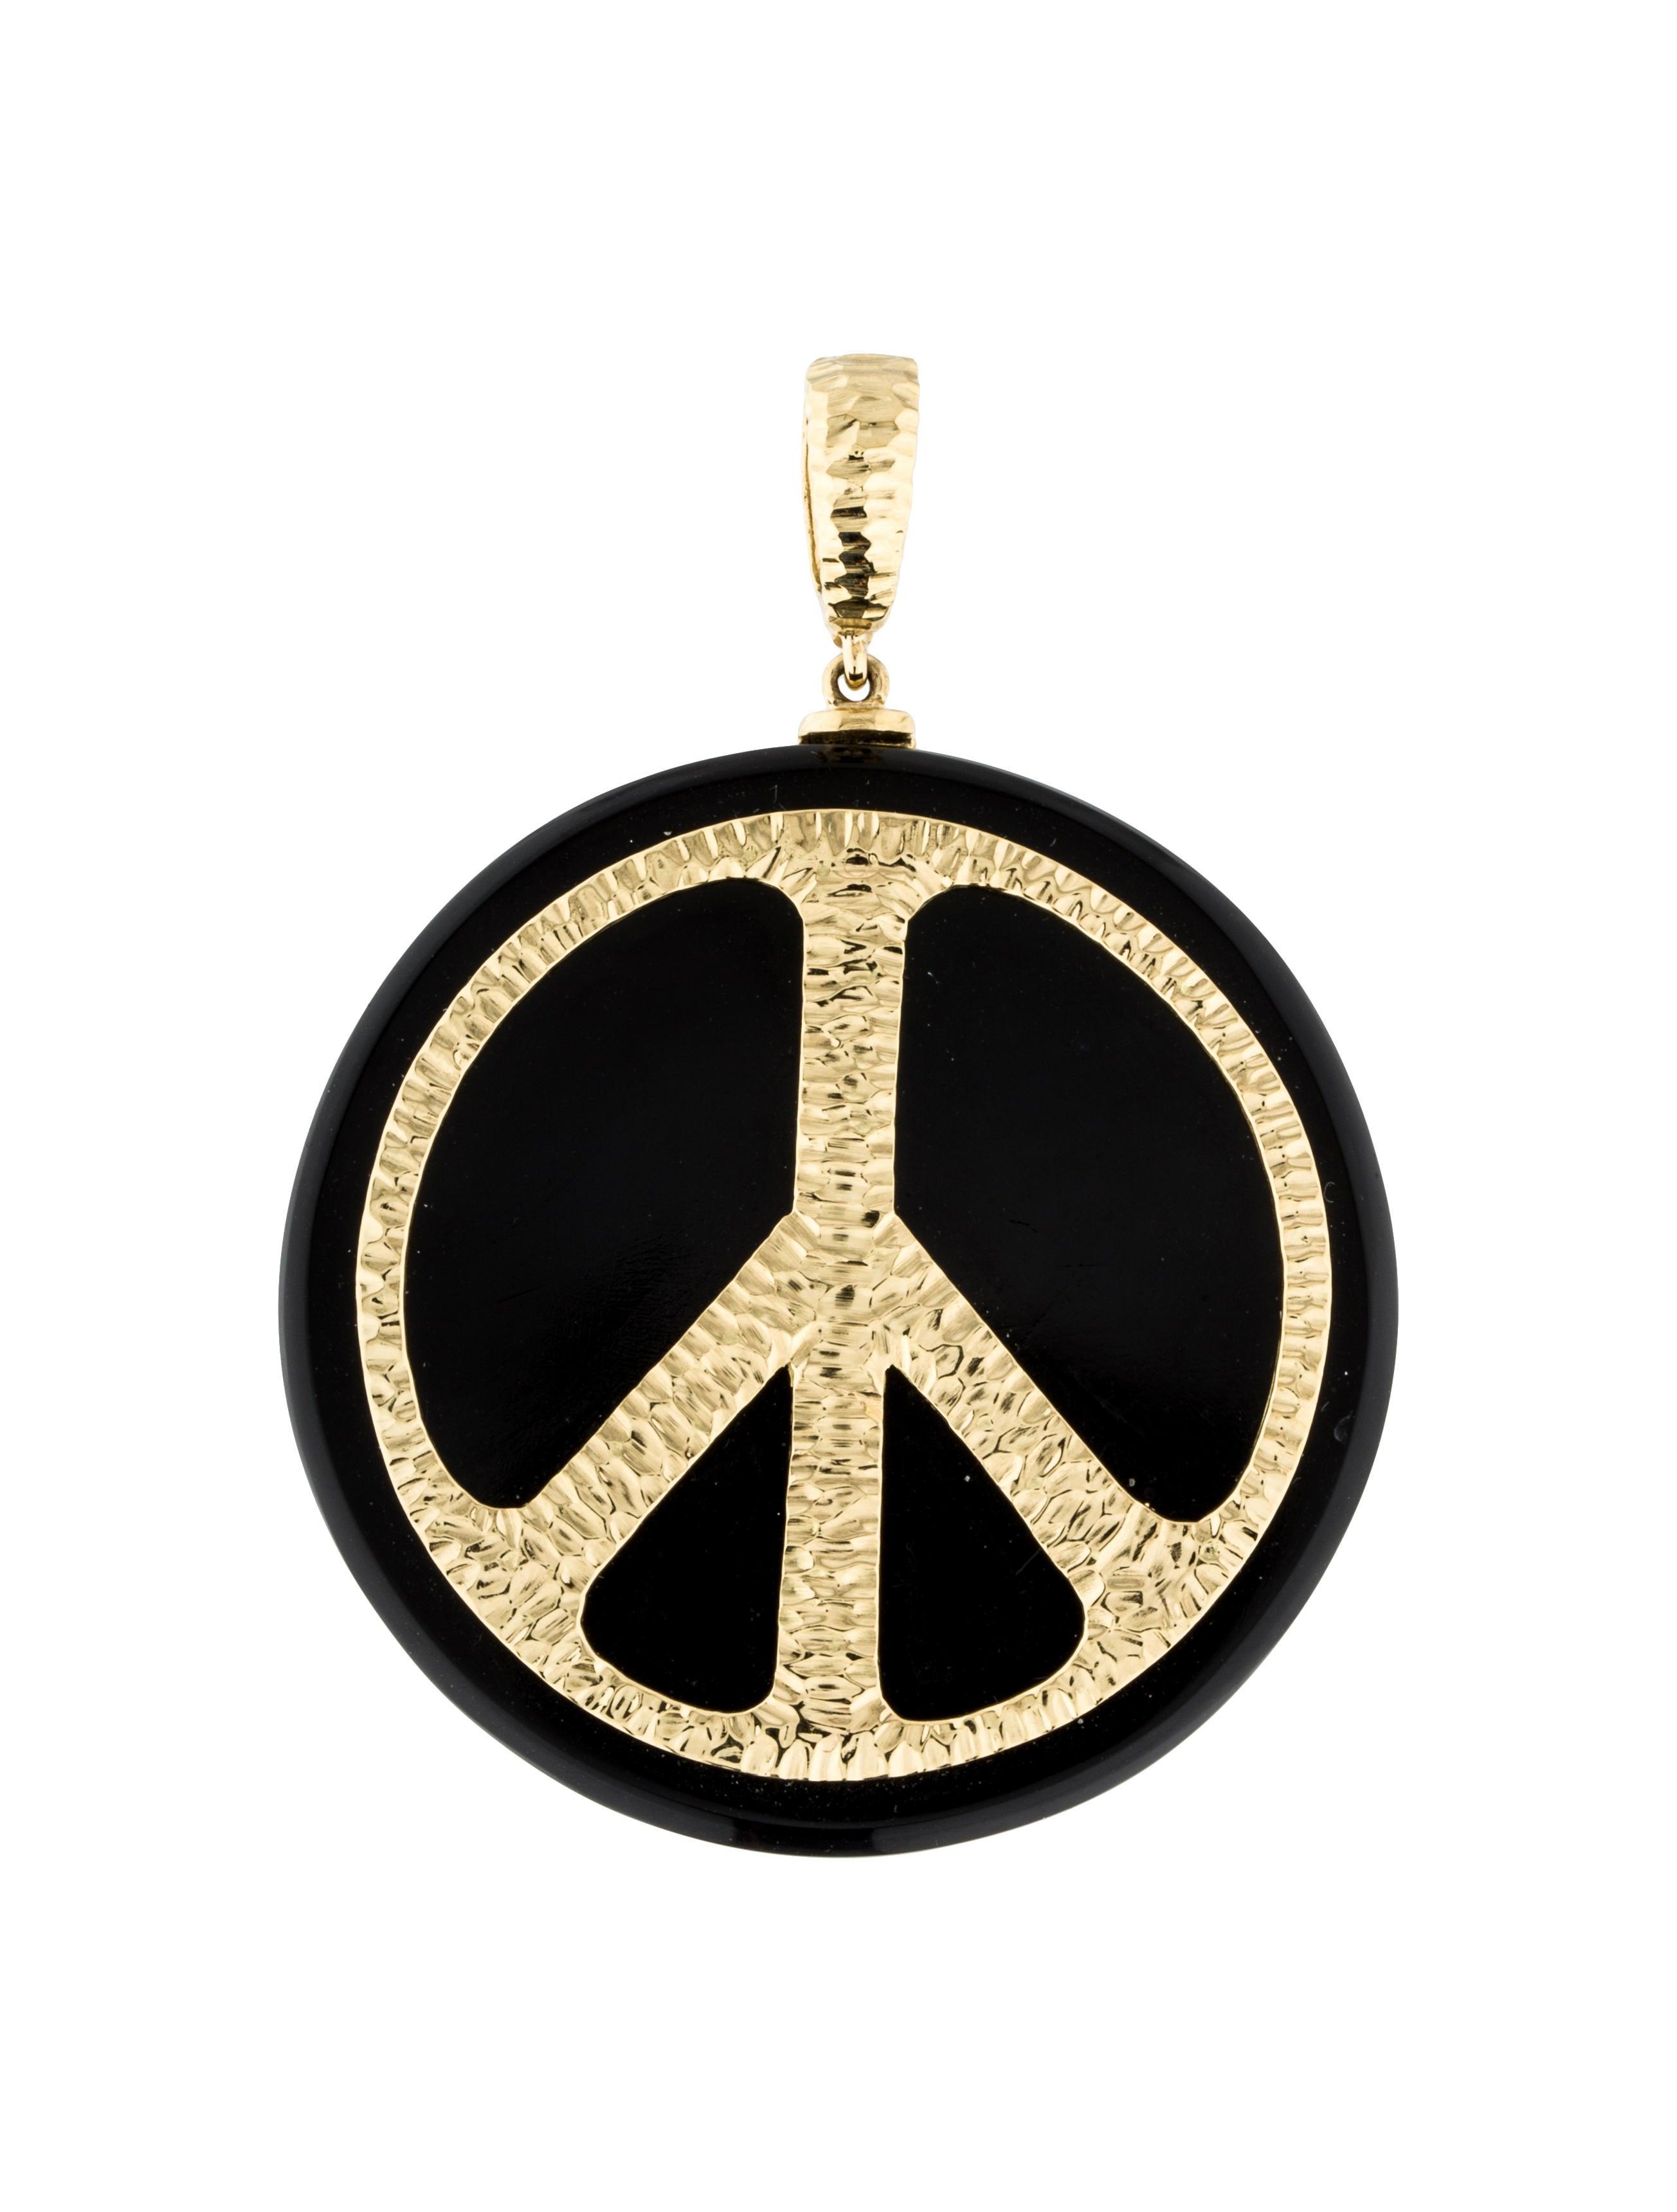 David webb 18k onyx peace sign pendant necklaces dwb20080 the 18k onyx peace sign pendant buycottarizona Gallery